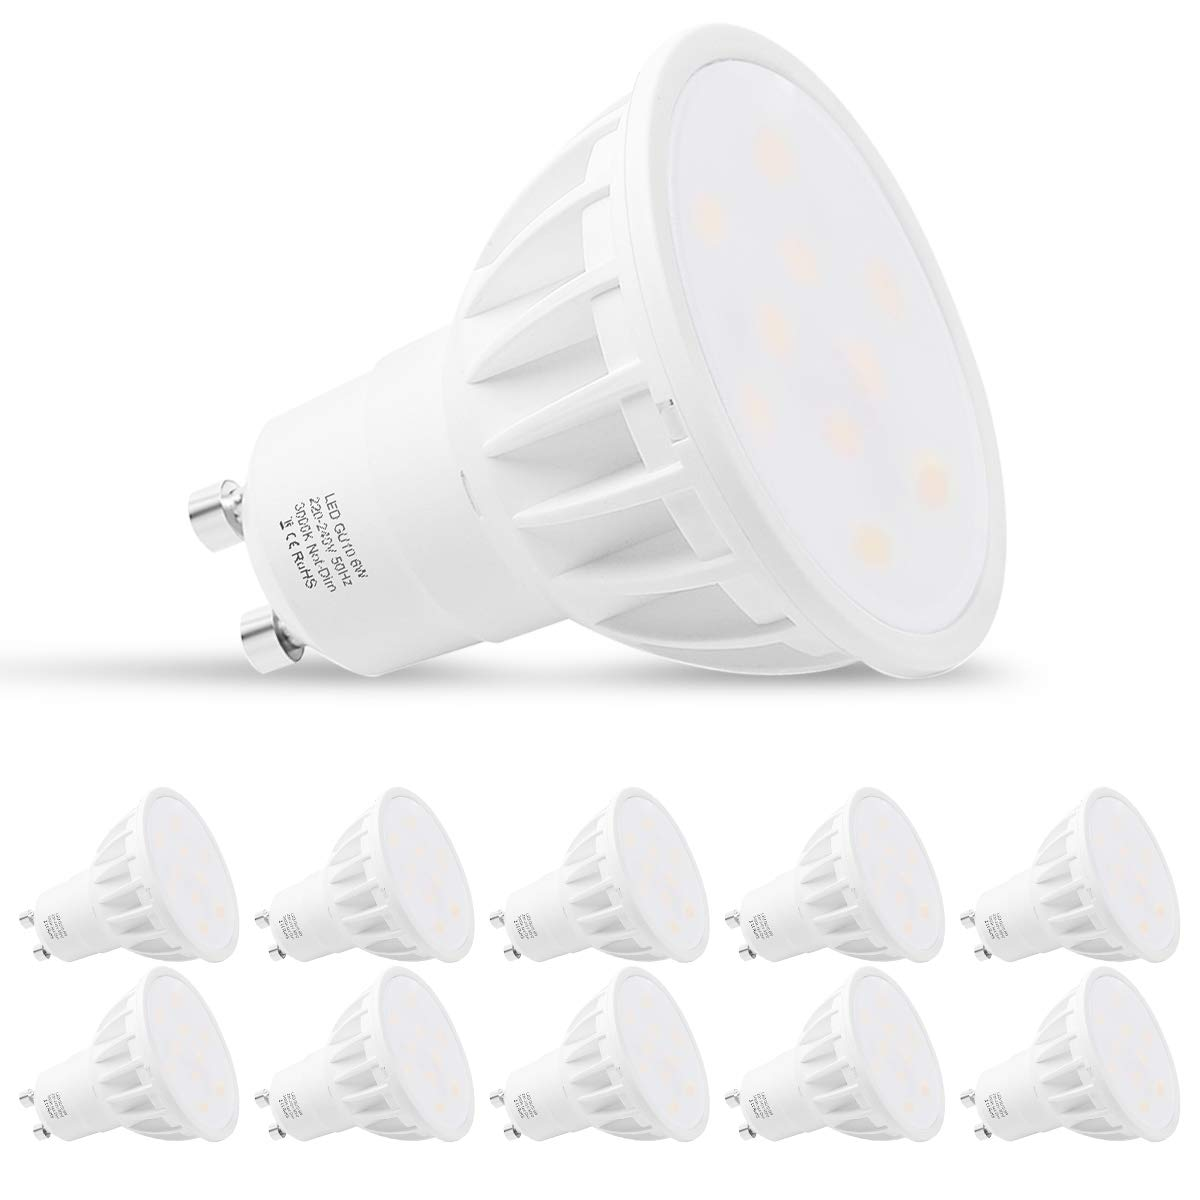 GU10 LED Light Bulbs, LEHASI Warm White 3000K LED Spot Light Bulbs, 6W Equivalent to 50W Halogen Bulb, 500Lm, 230V, Non Dimmable, 120 Degree Beam Angle, Ideal for Home Lighting, Pack of 10